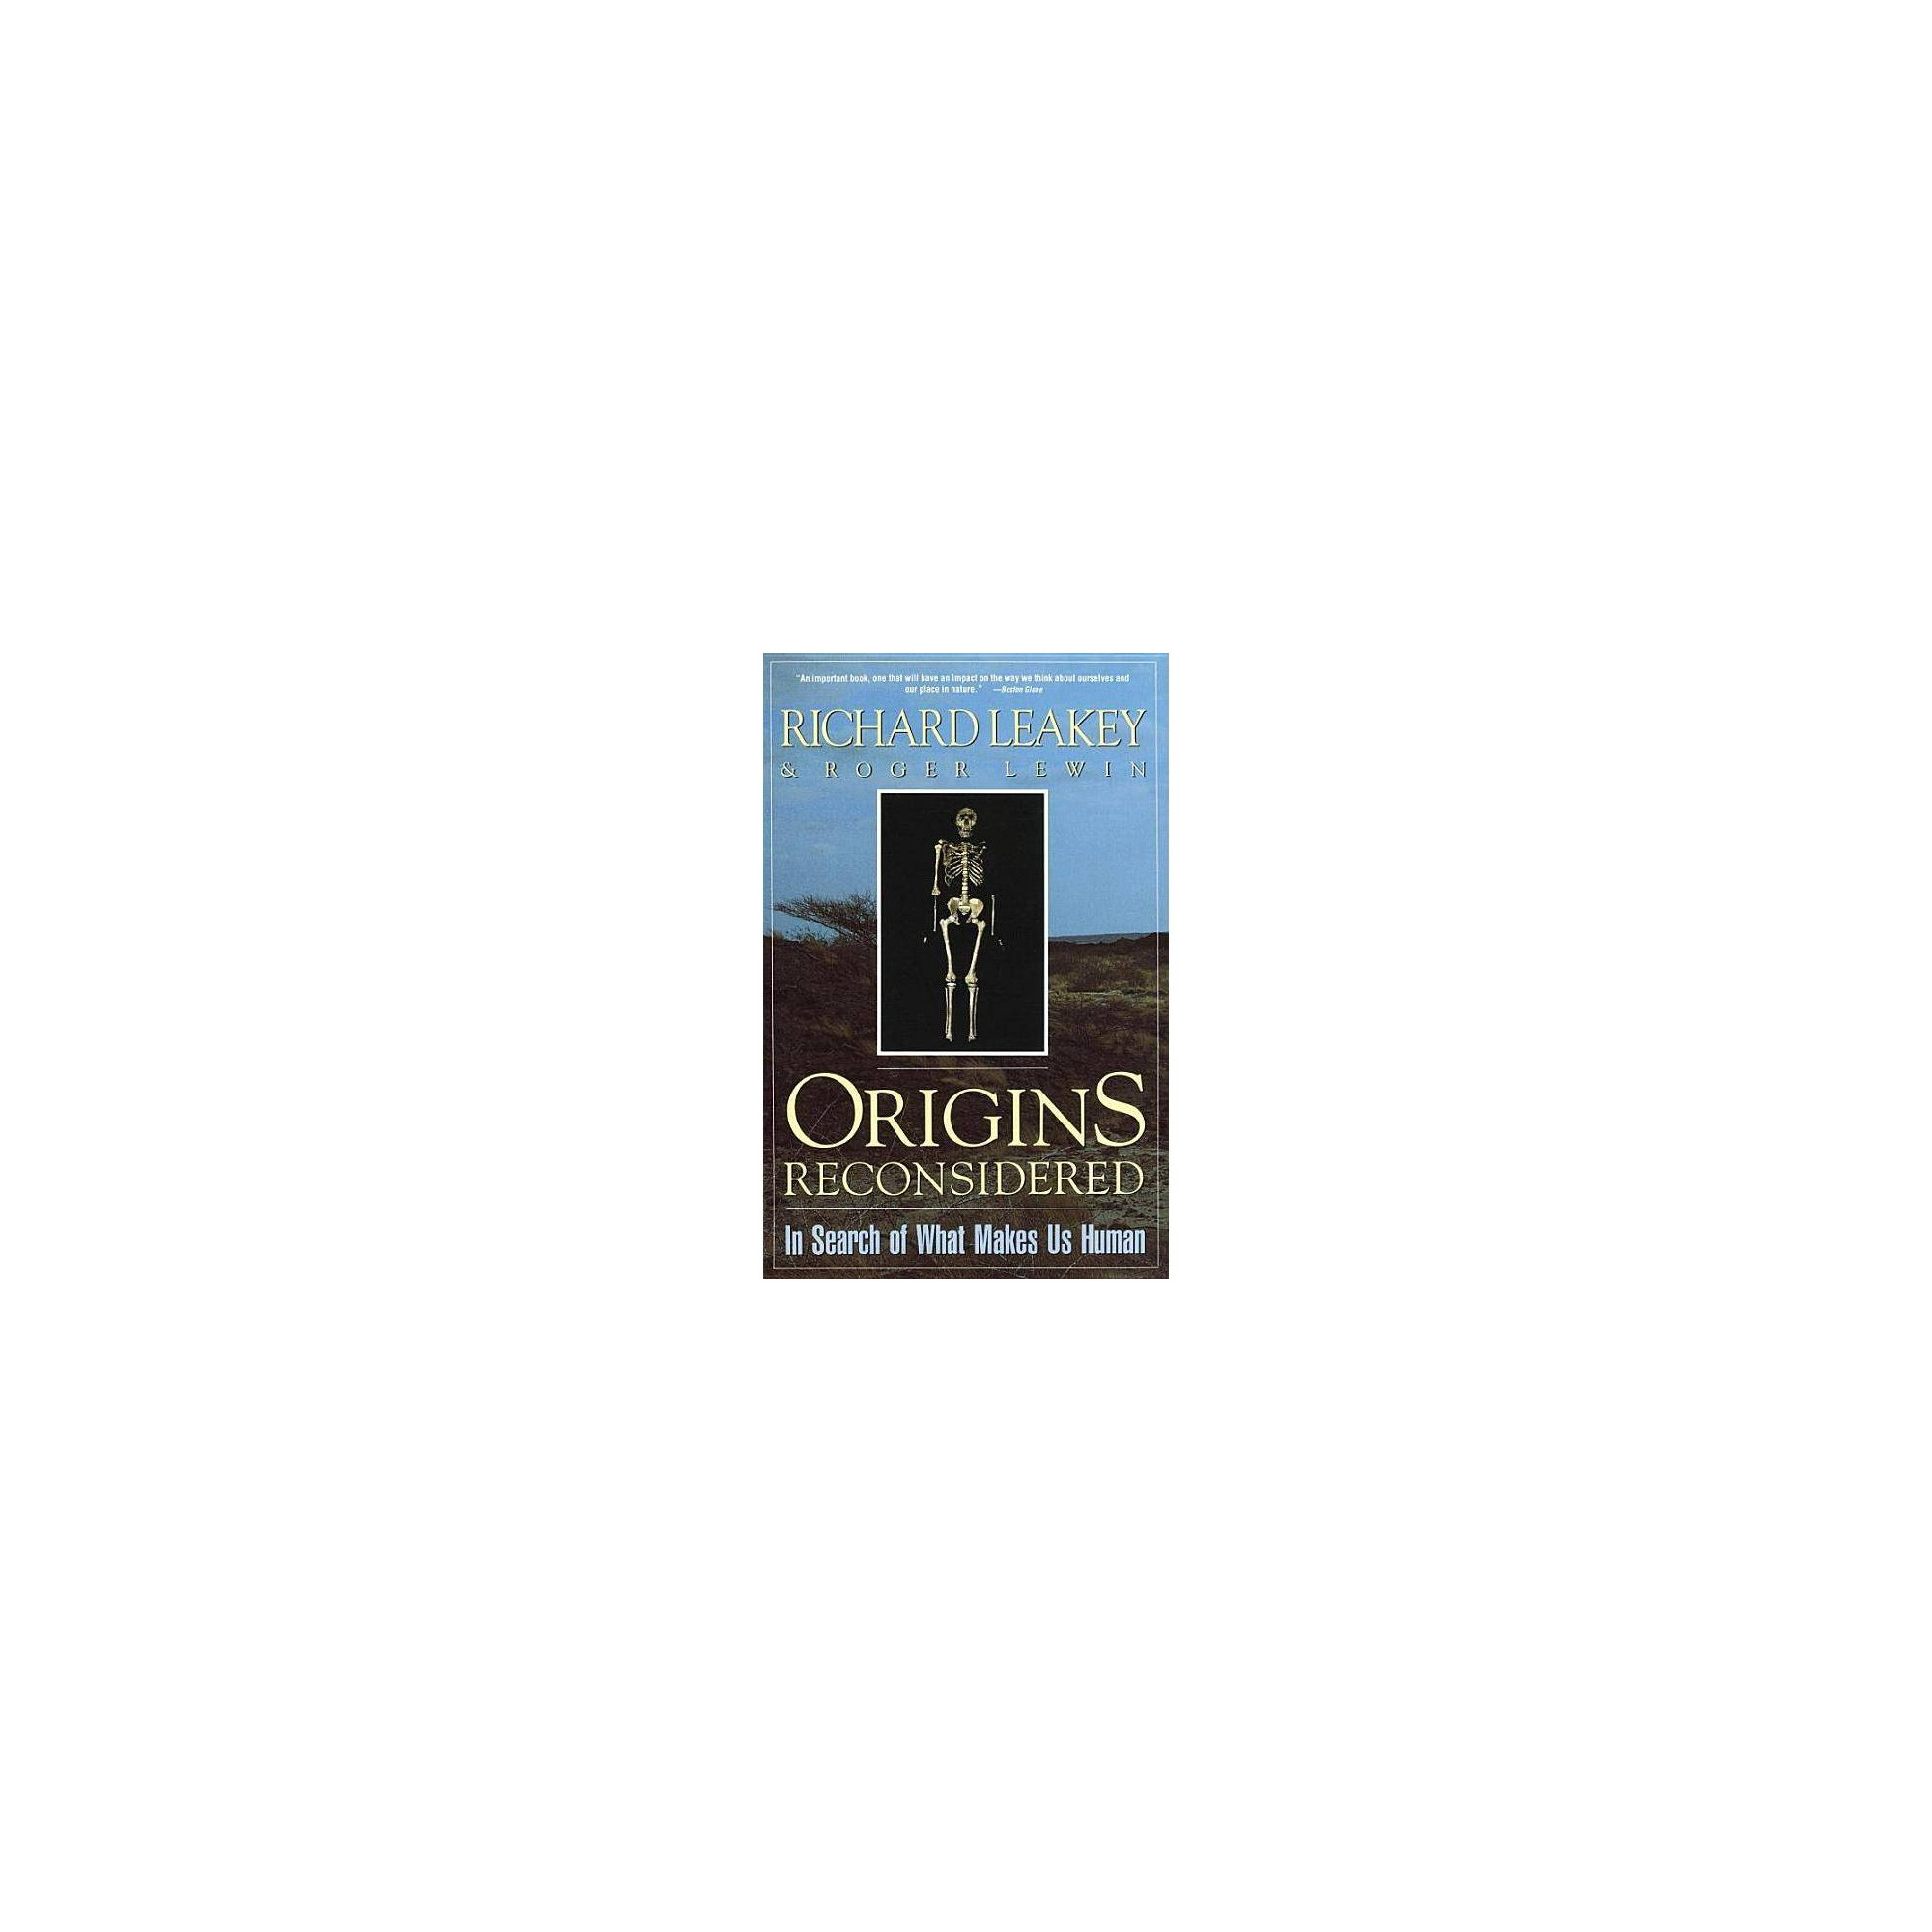 Origins Reconsidered - by Richard E Leakey (Paperback)